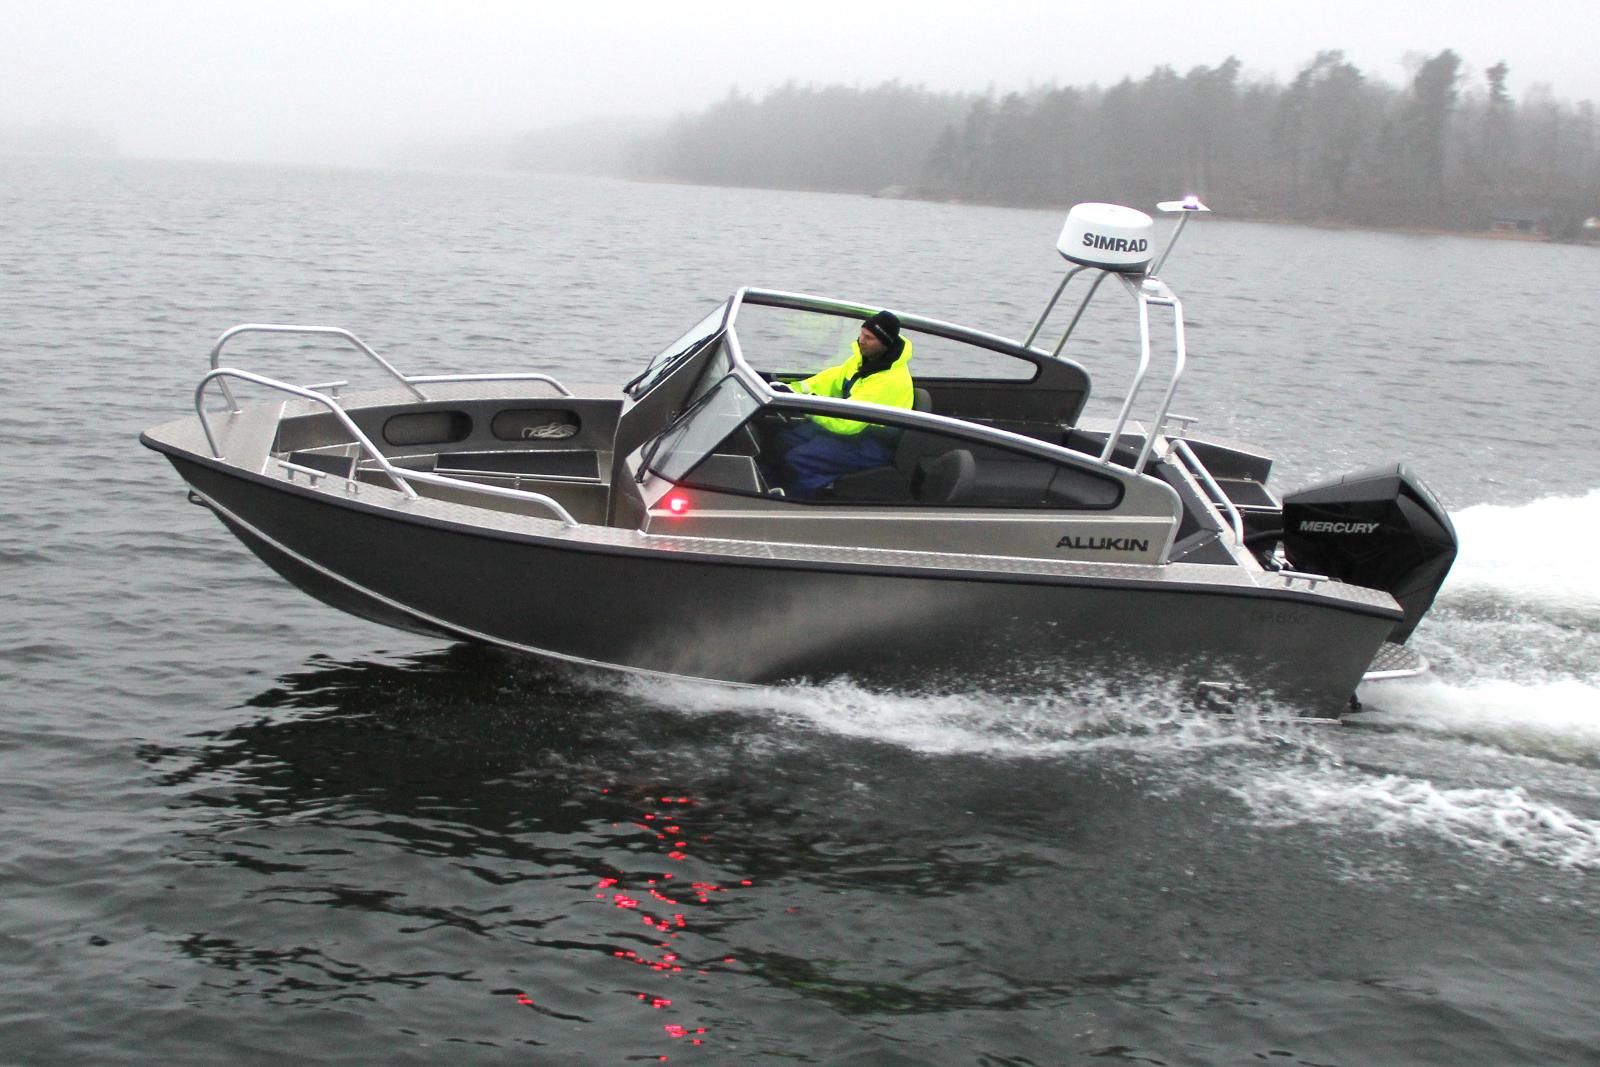 Alukin DP 650, nyhet 2020, med Mercury V6-200 hk